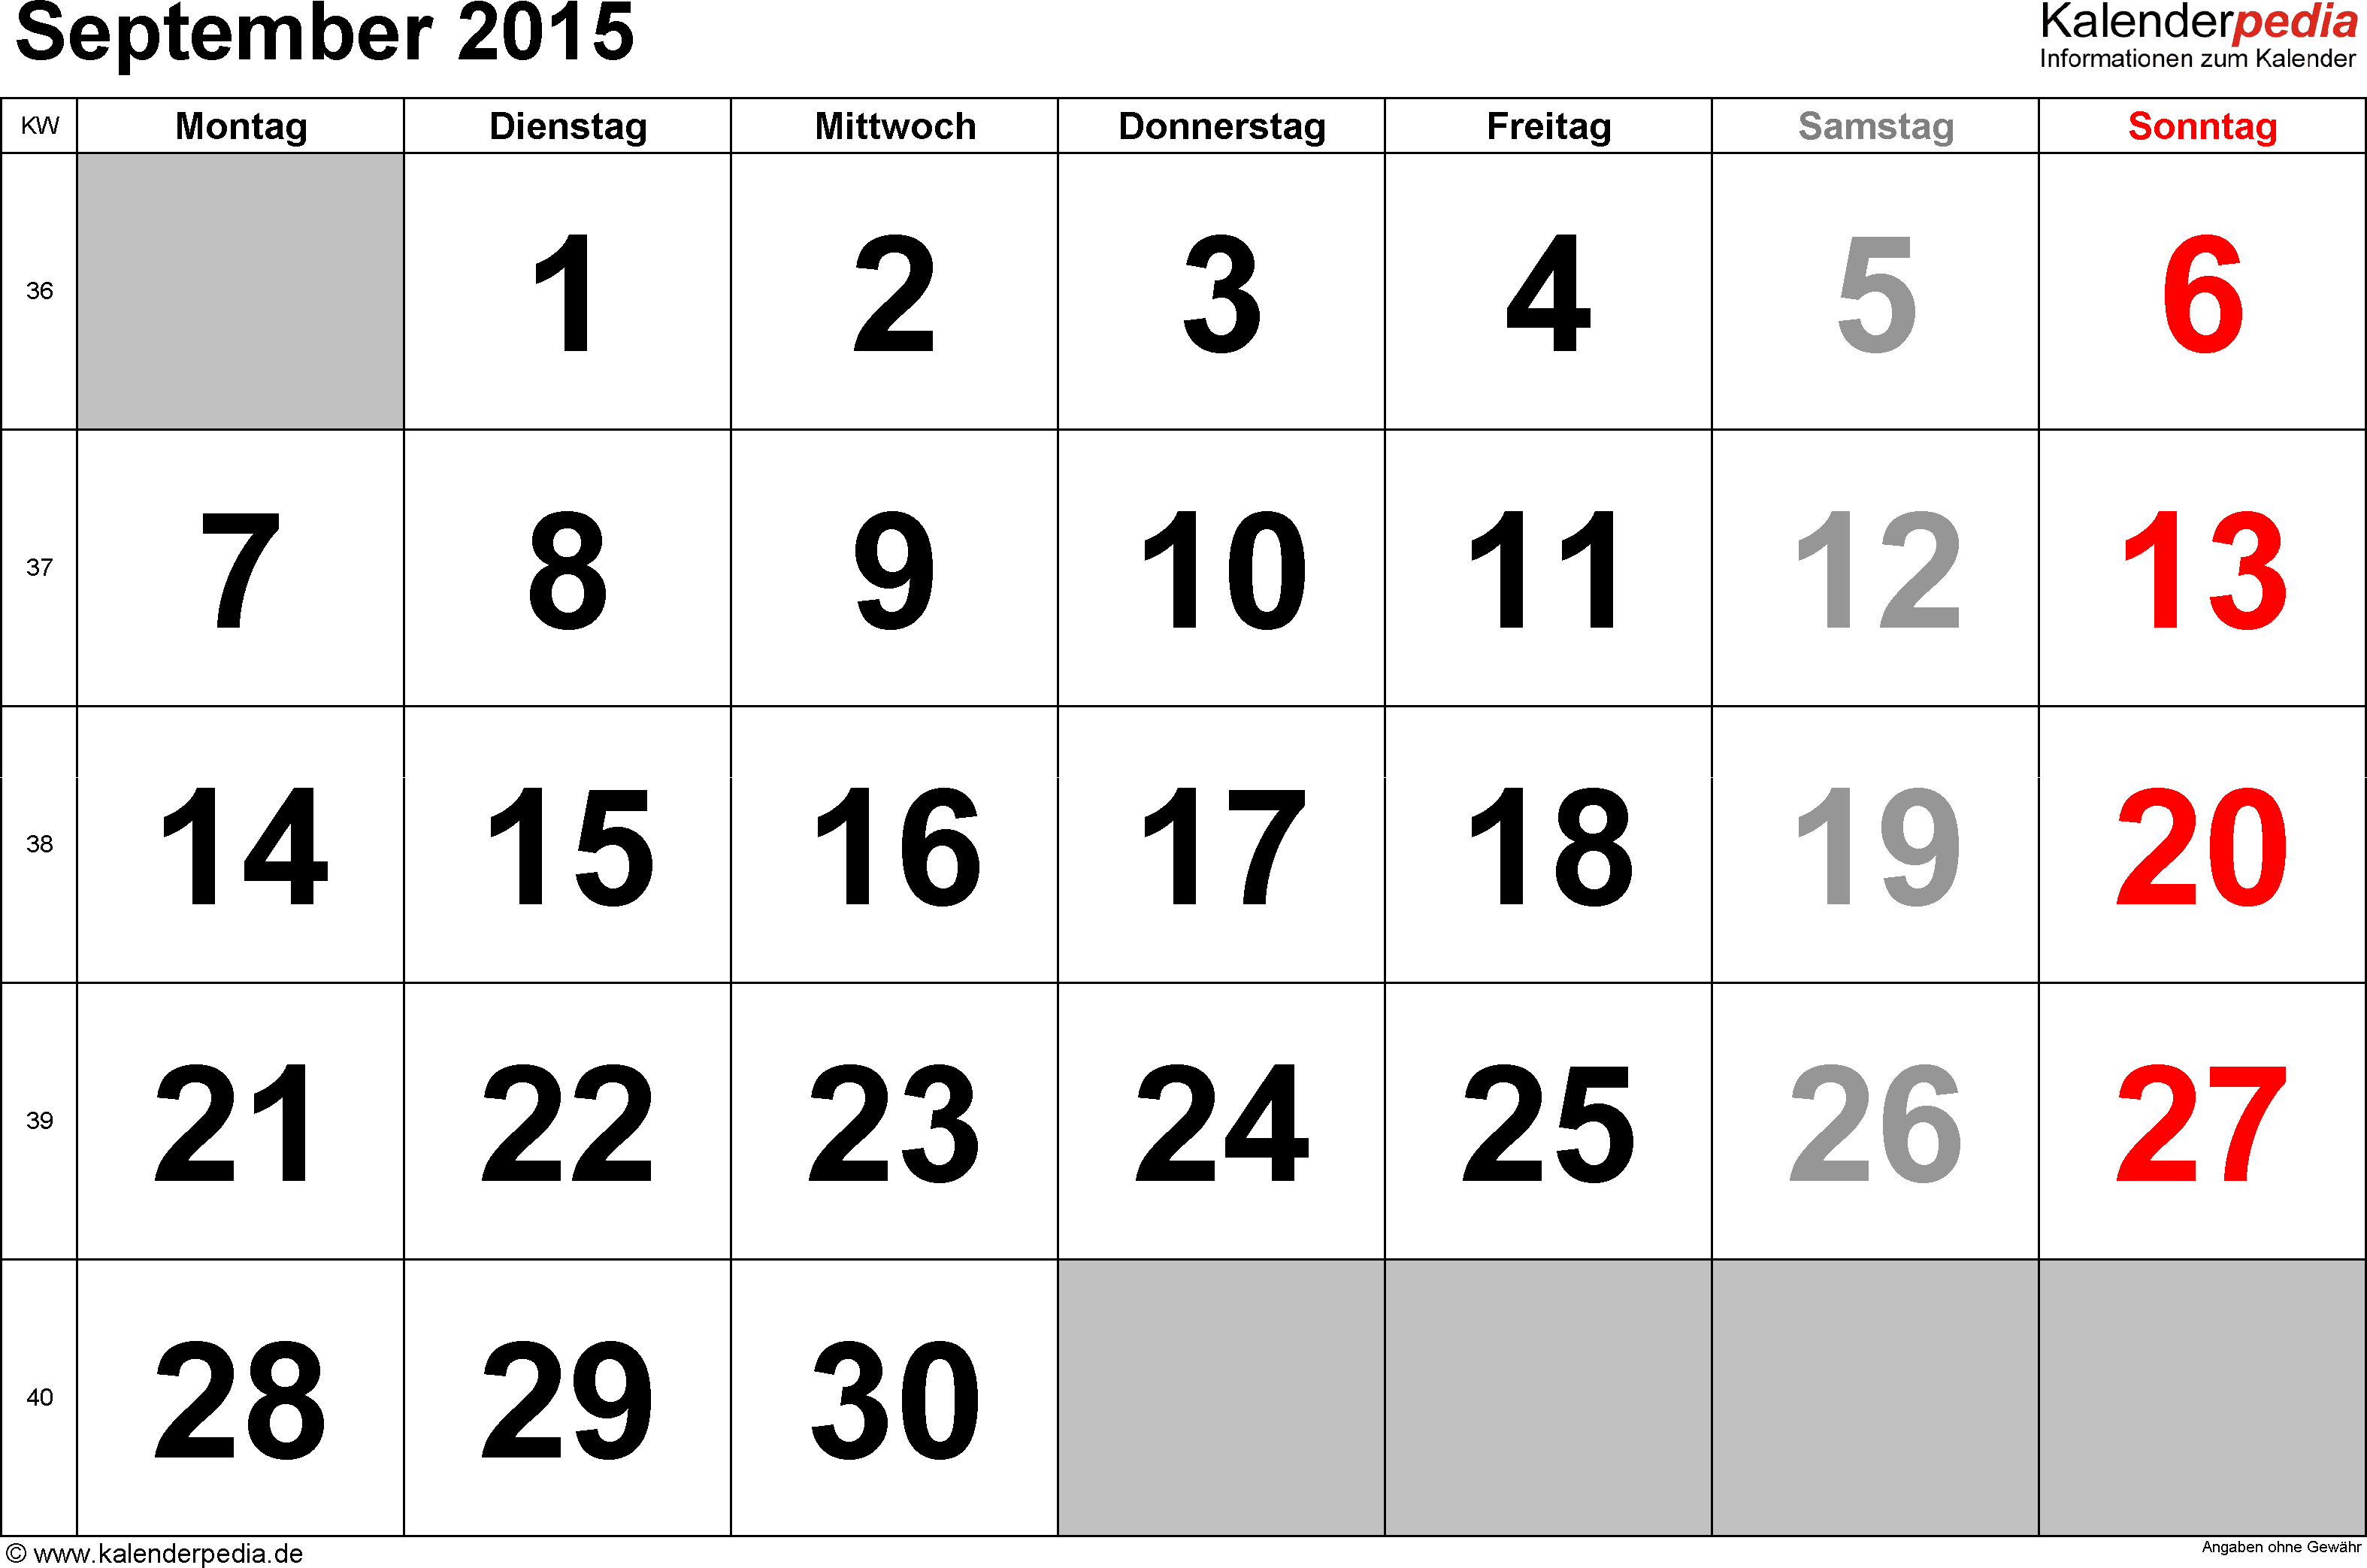 Kalender September 2015 im Querformat, grosse Ziffern